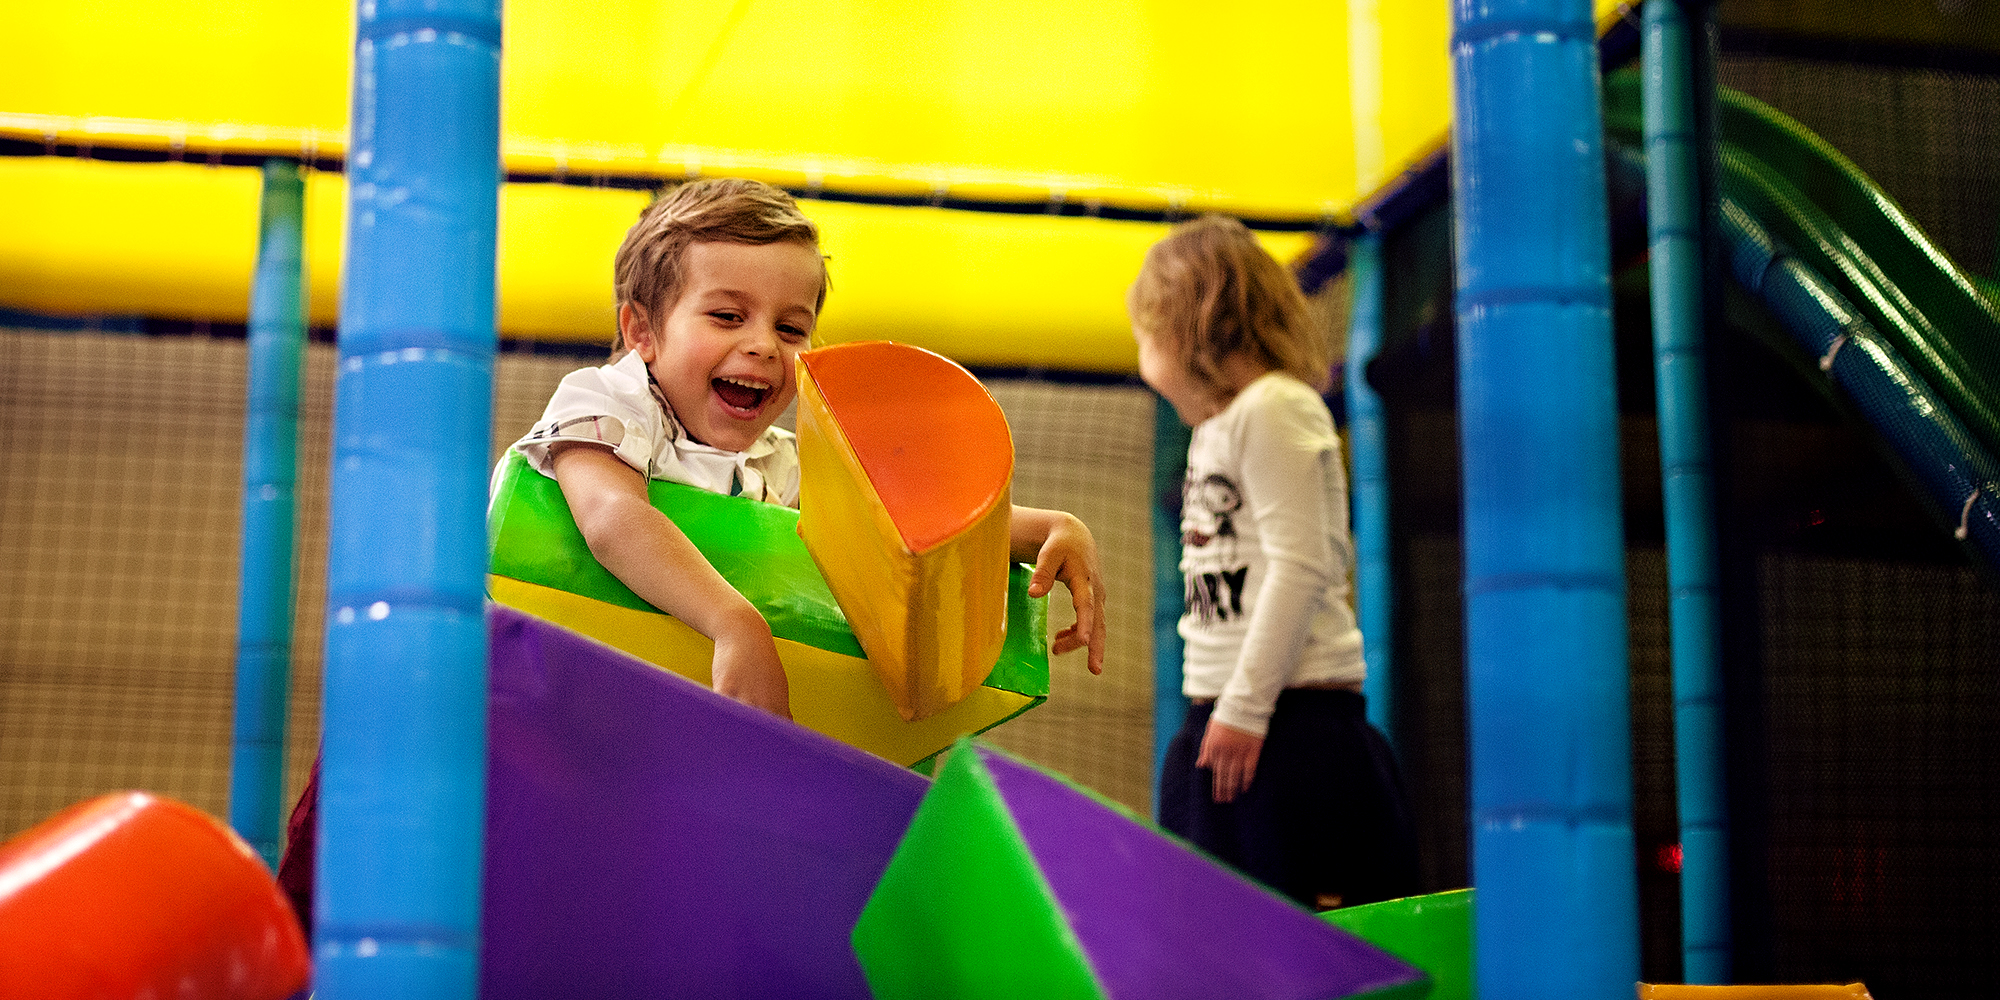 Lykkeland, a play centre in Steinkjer - boy in play. Copyright: Lykkeland